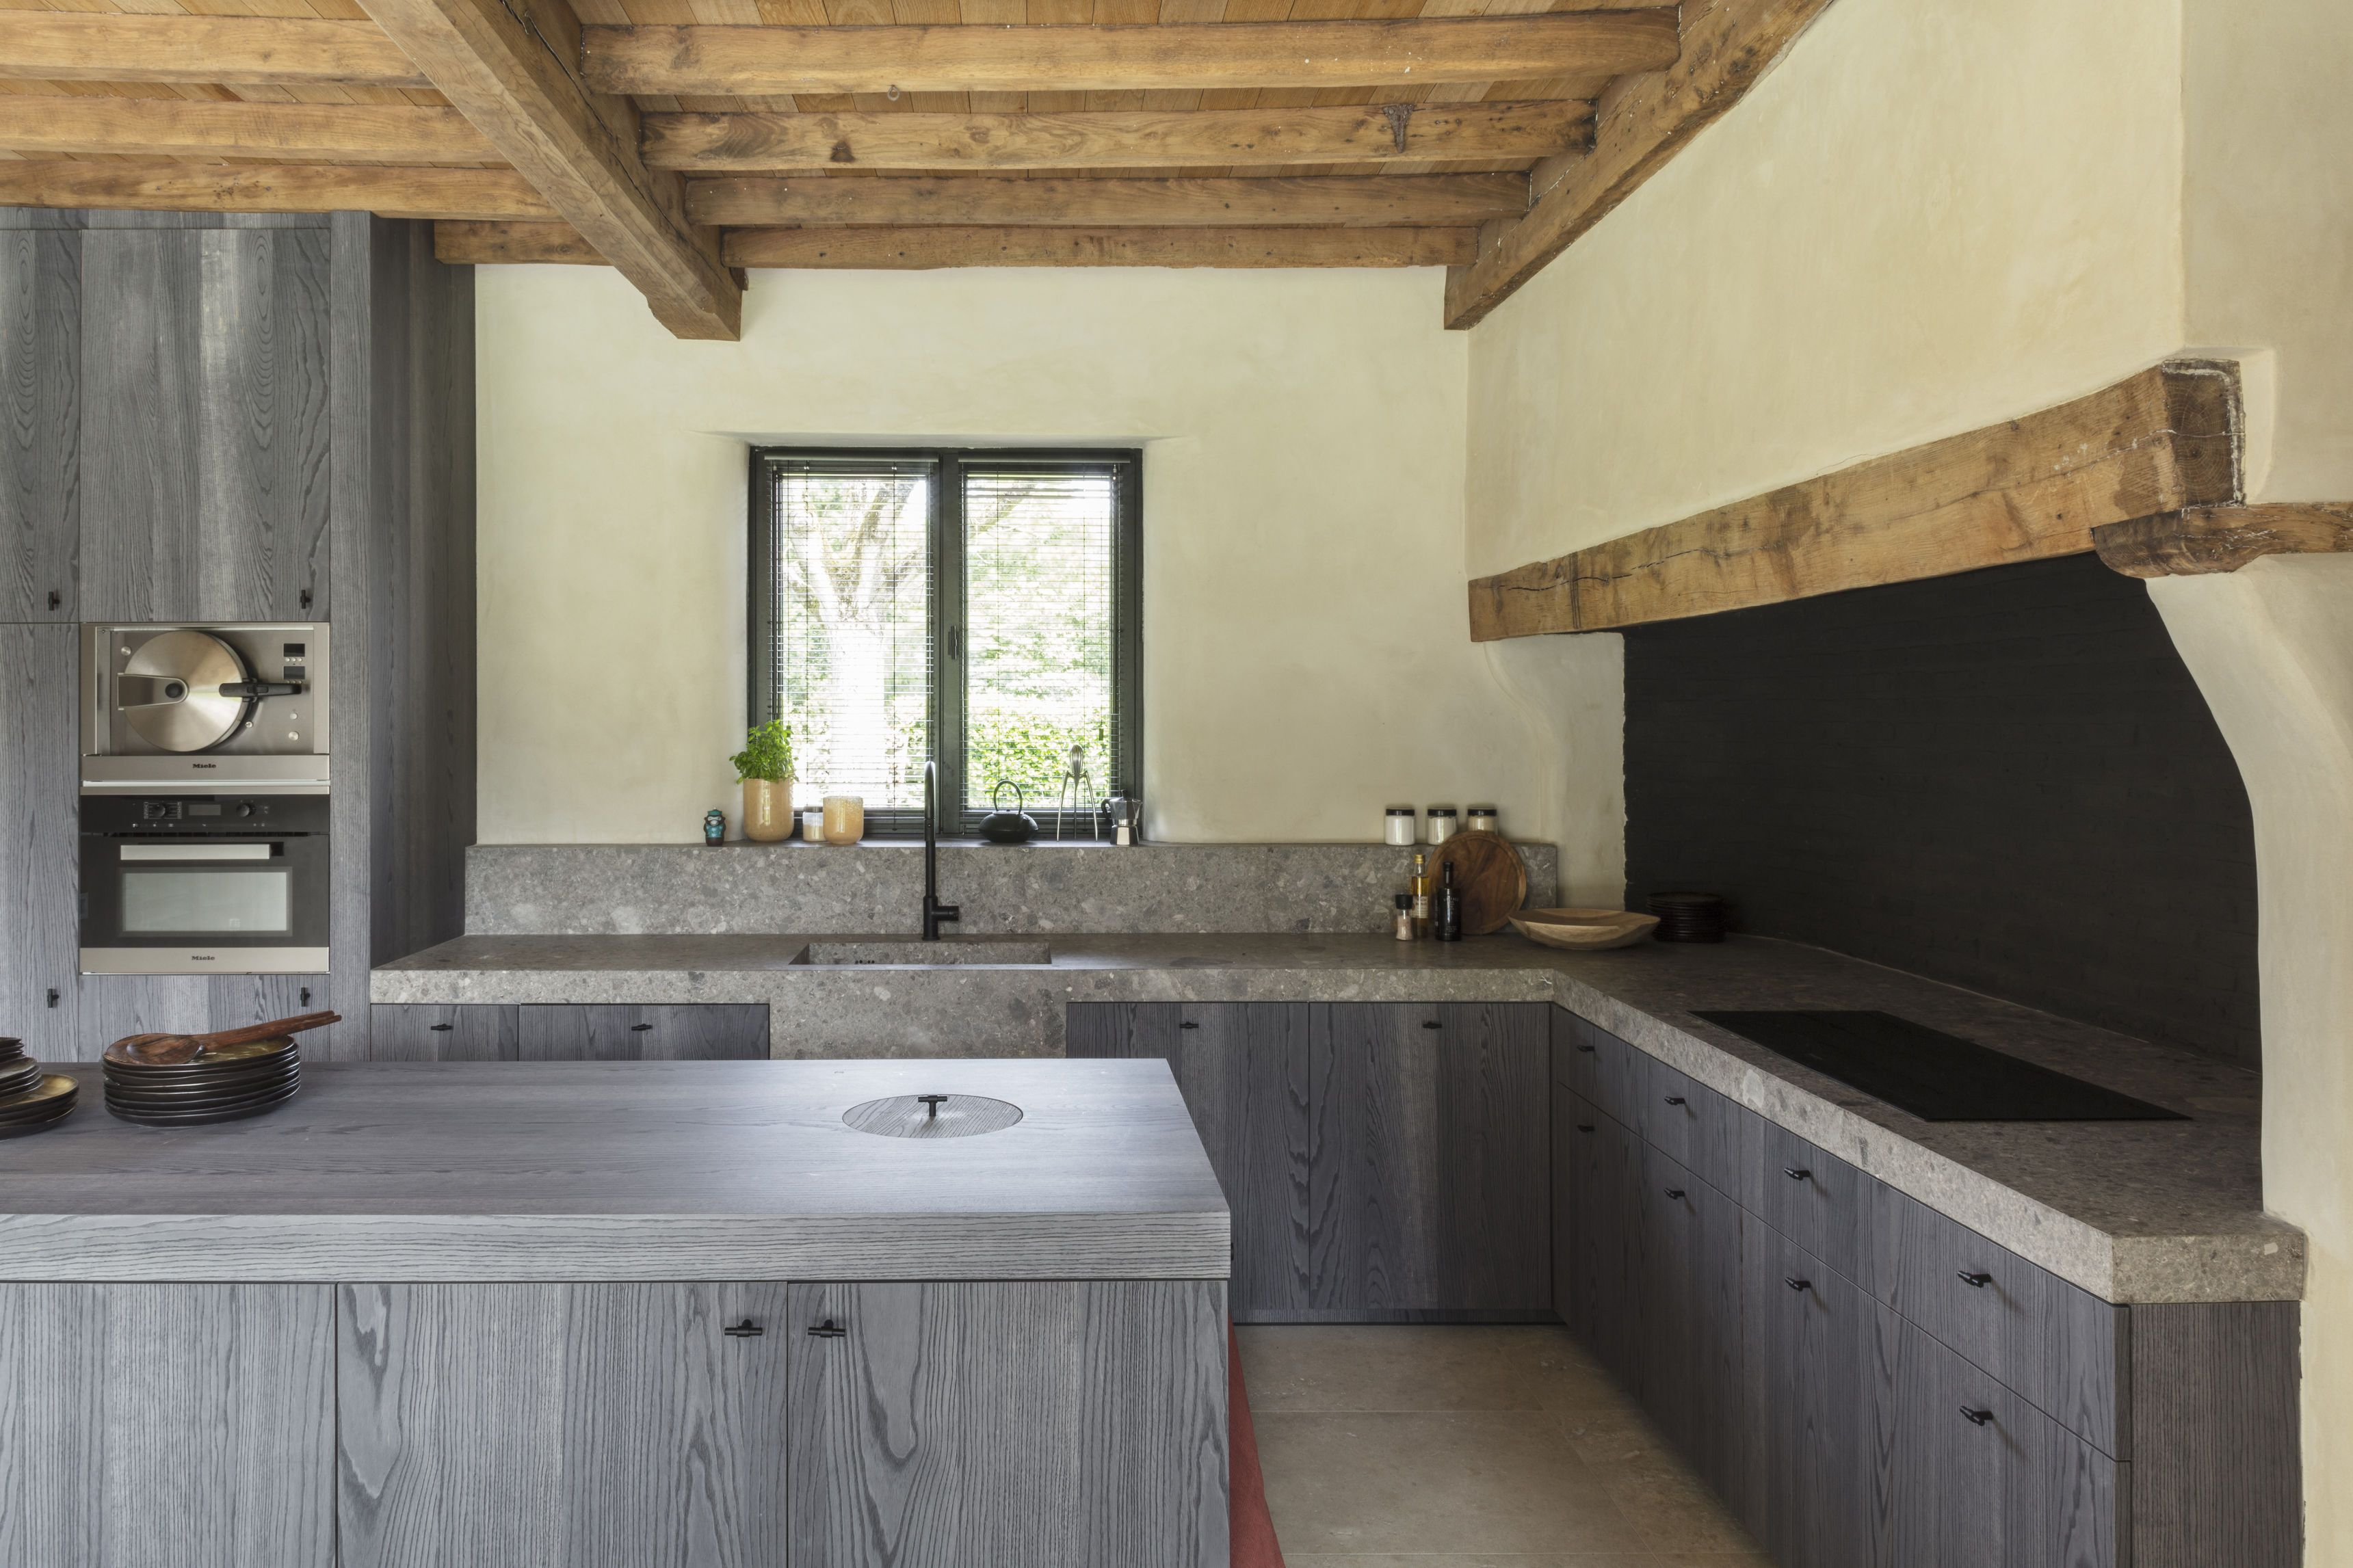 Hoeve cl kitchen pinterest tuin inspiratie keuken and hoeve